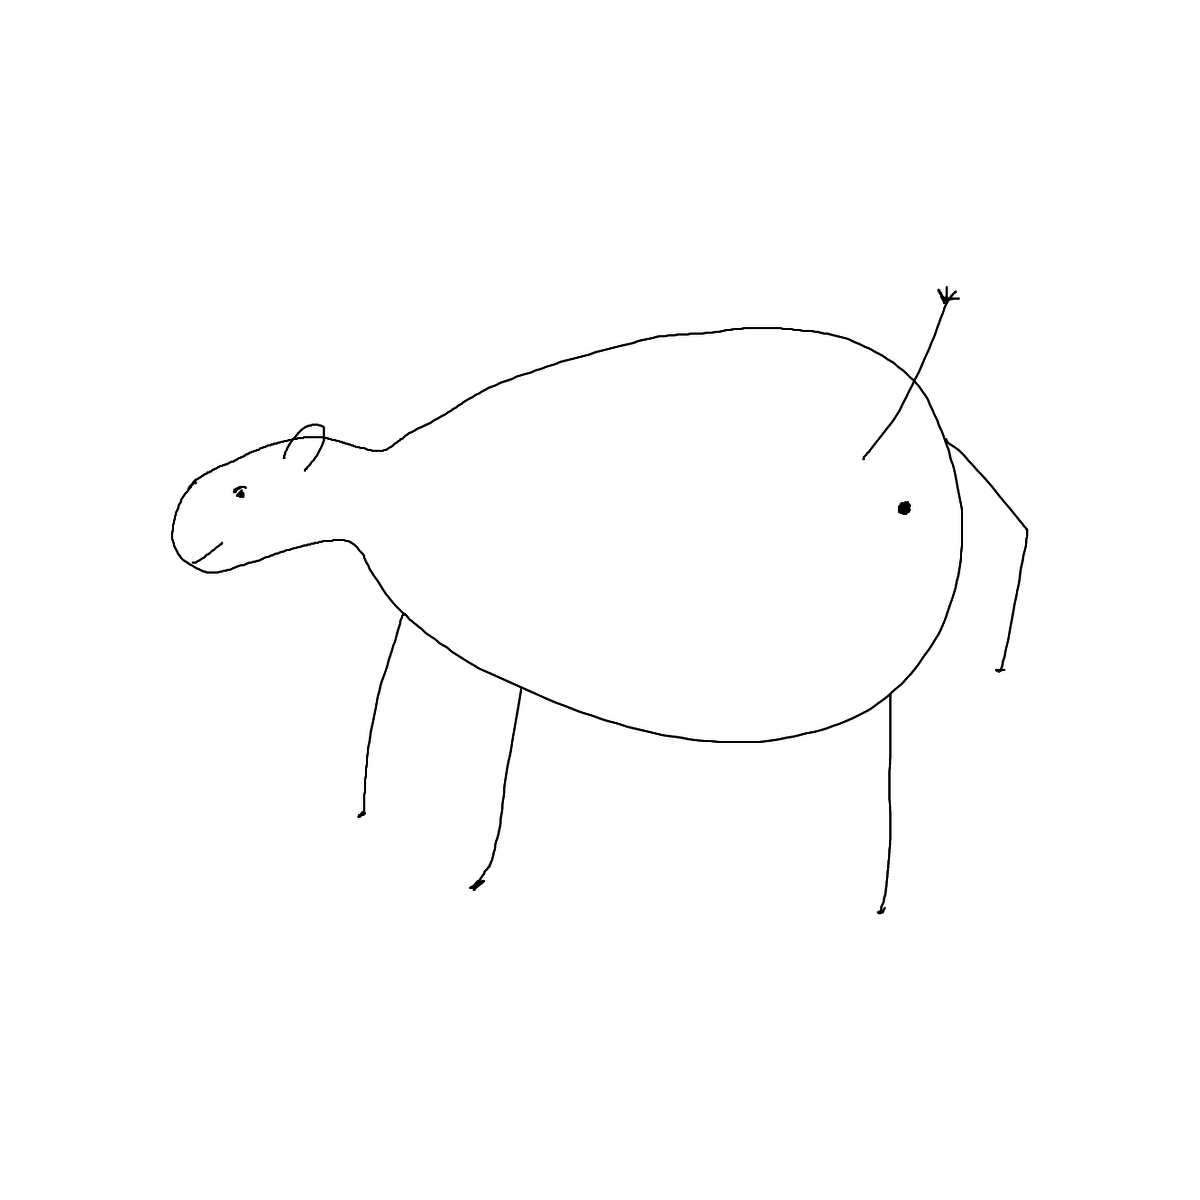 BAAAM drawing#5933 lat:40.7723159790039060lng: -73.9741210937500000